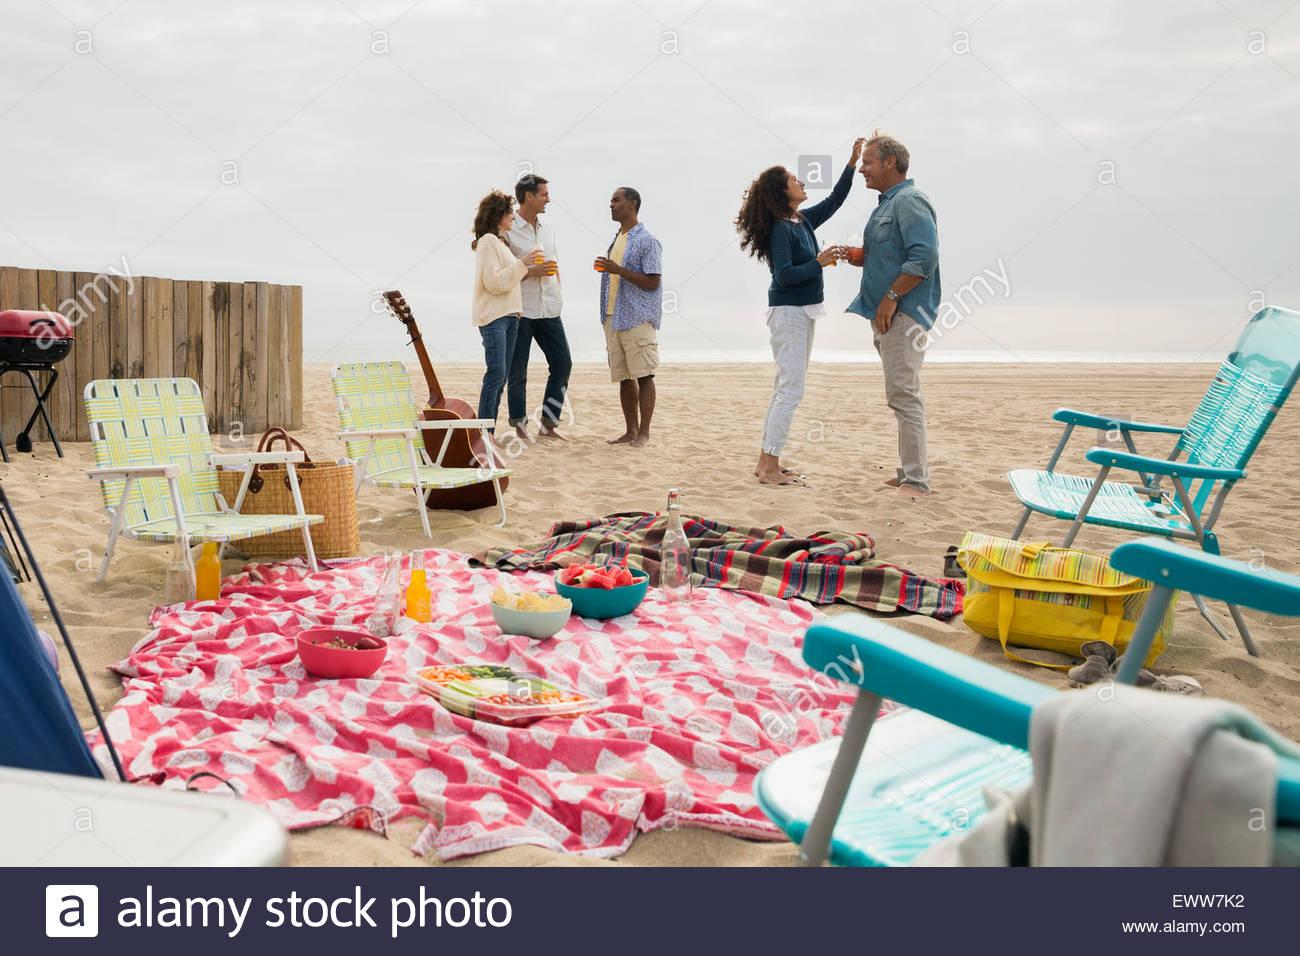 Friends enjoying beach picnic - Stock Image